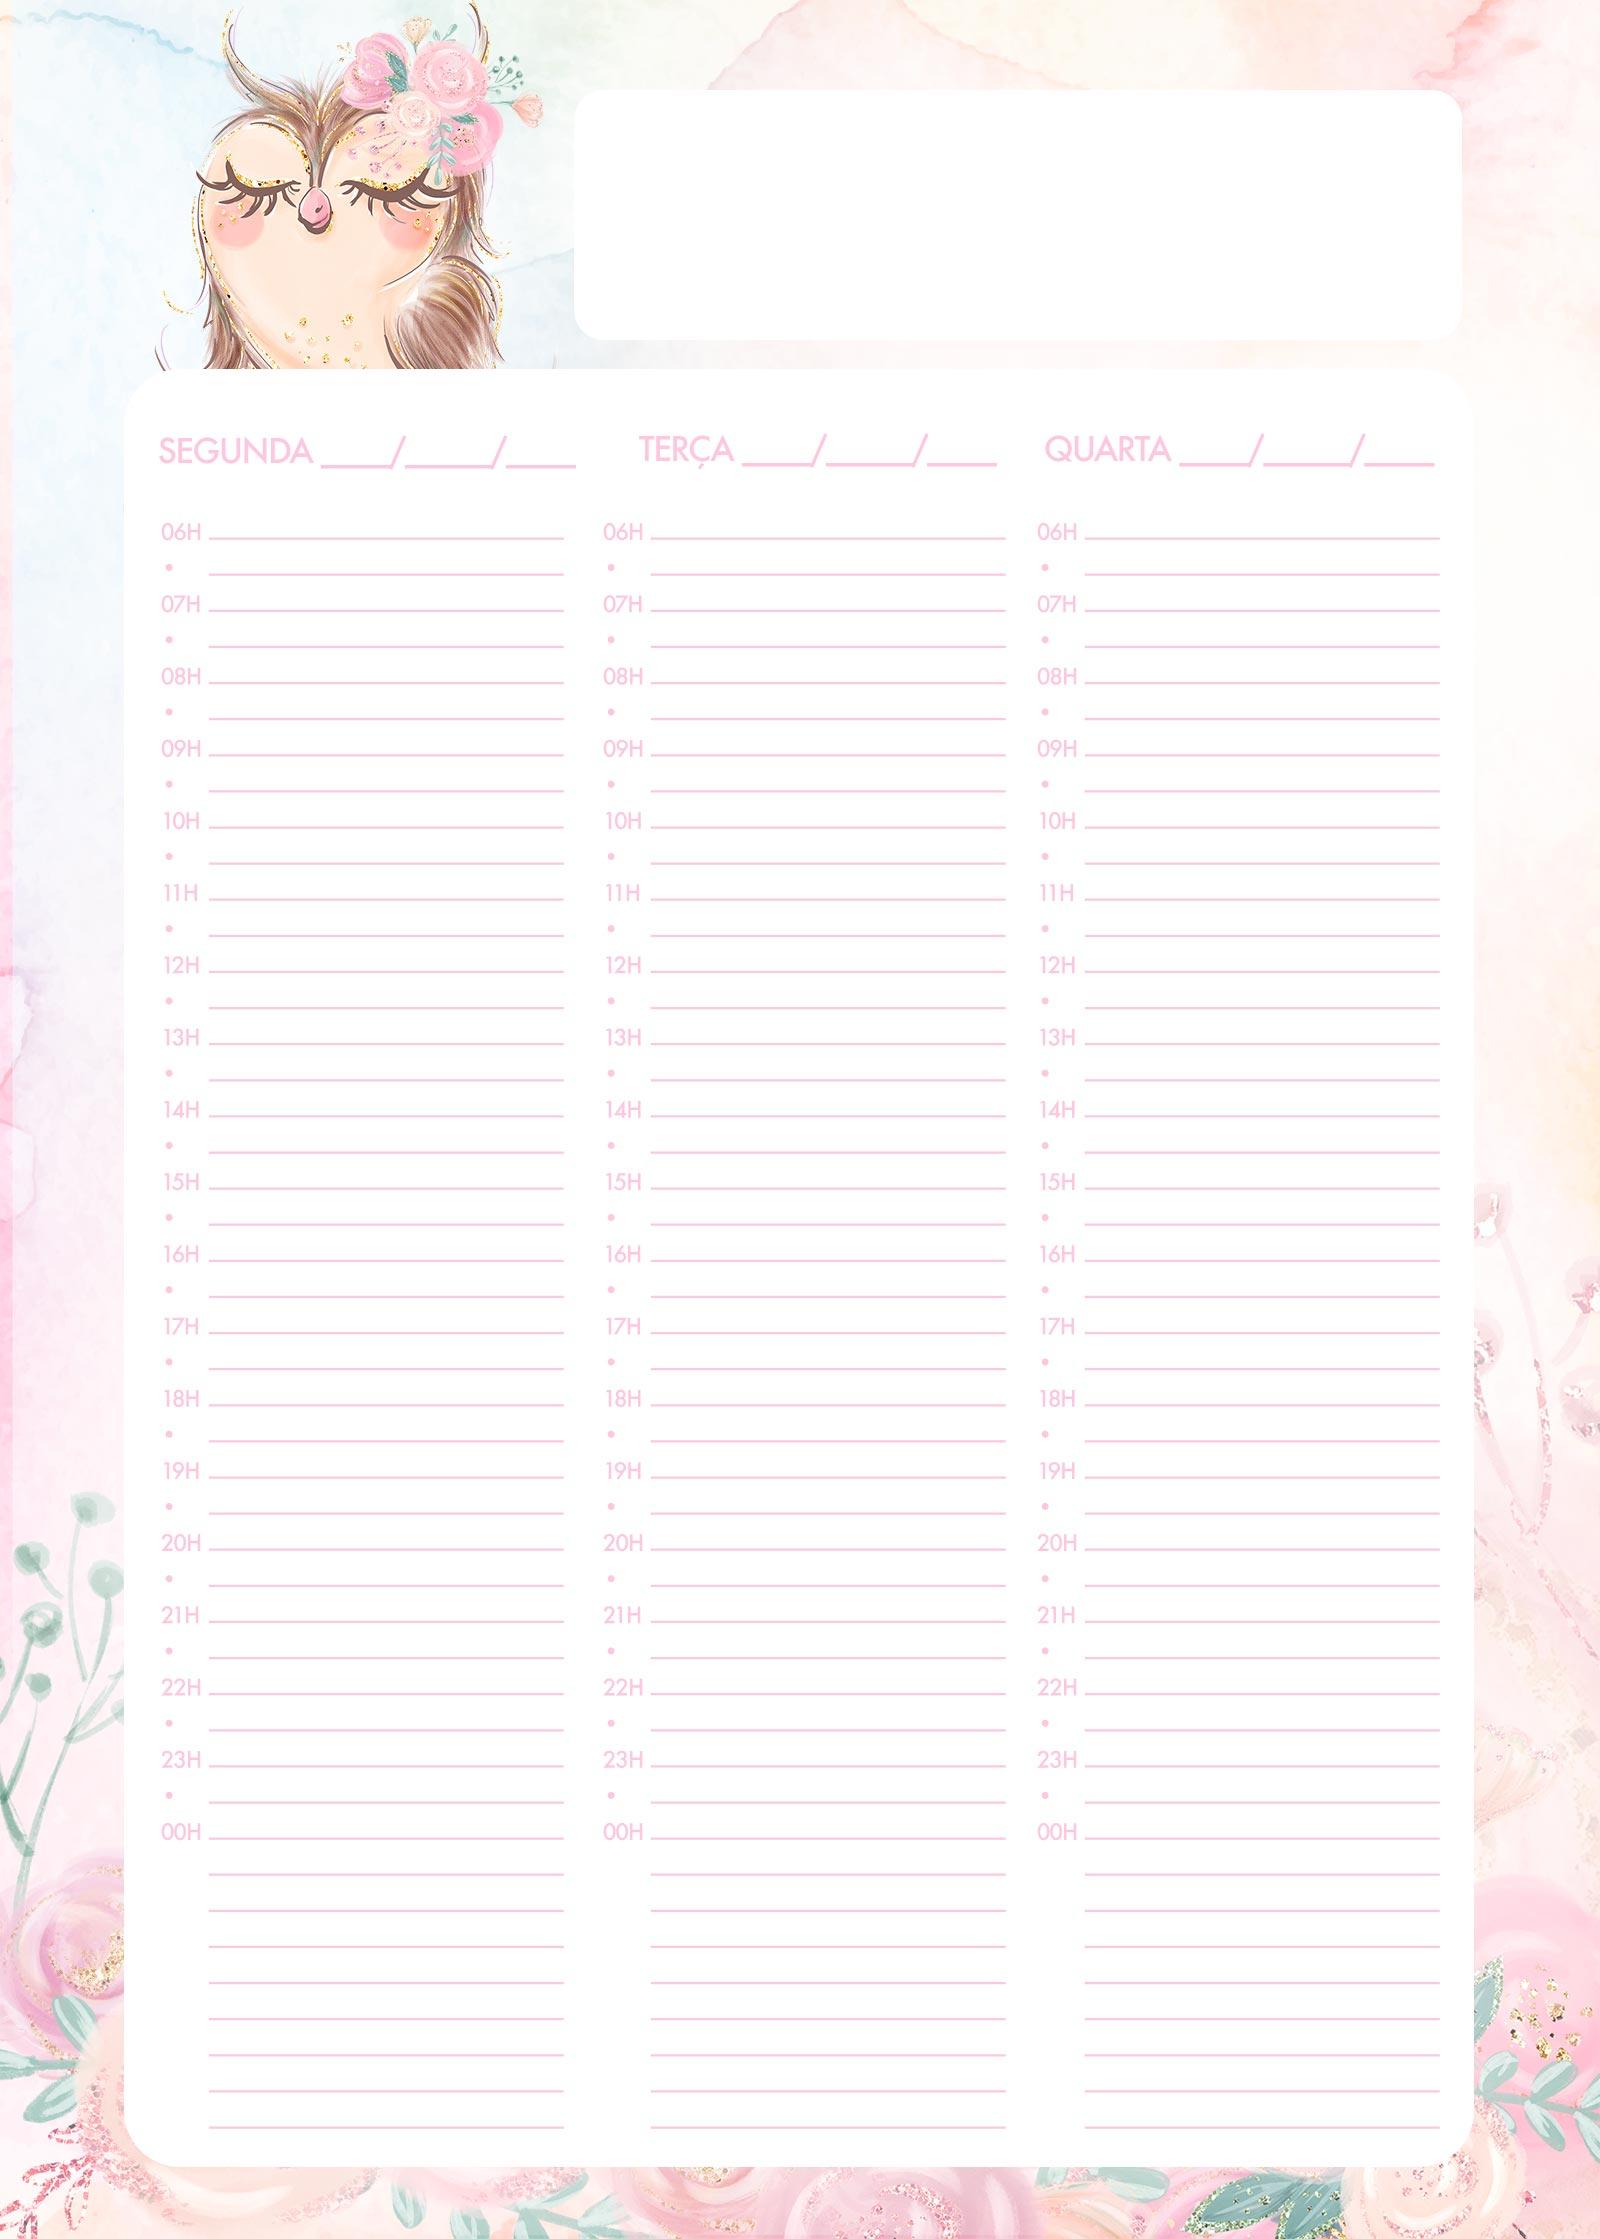 Planner Semanal Corujinha 1